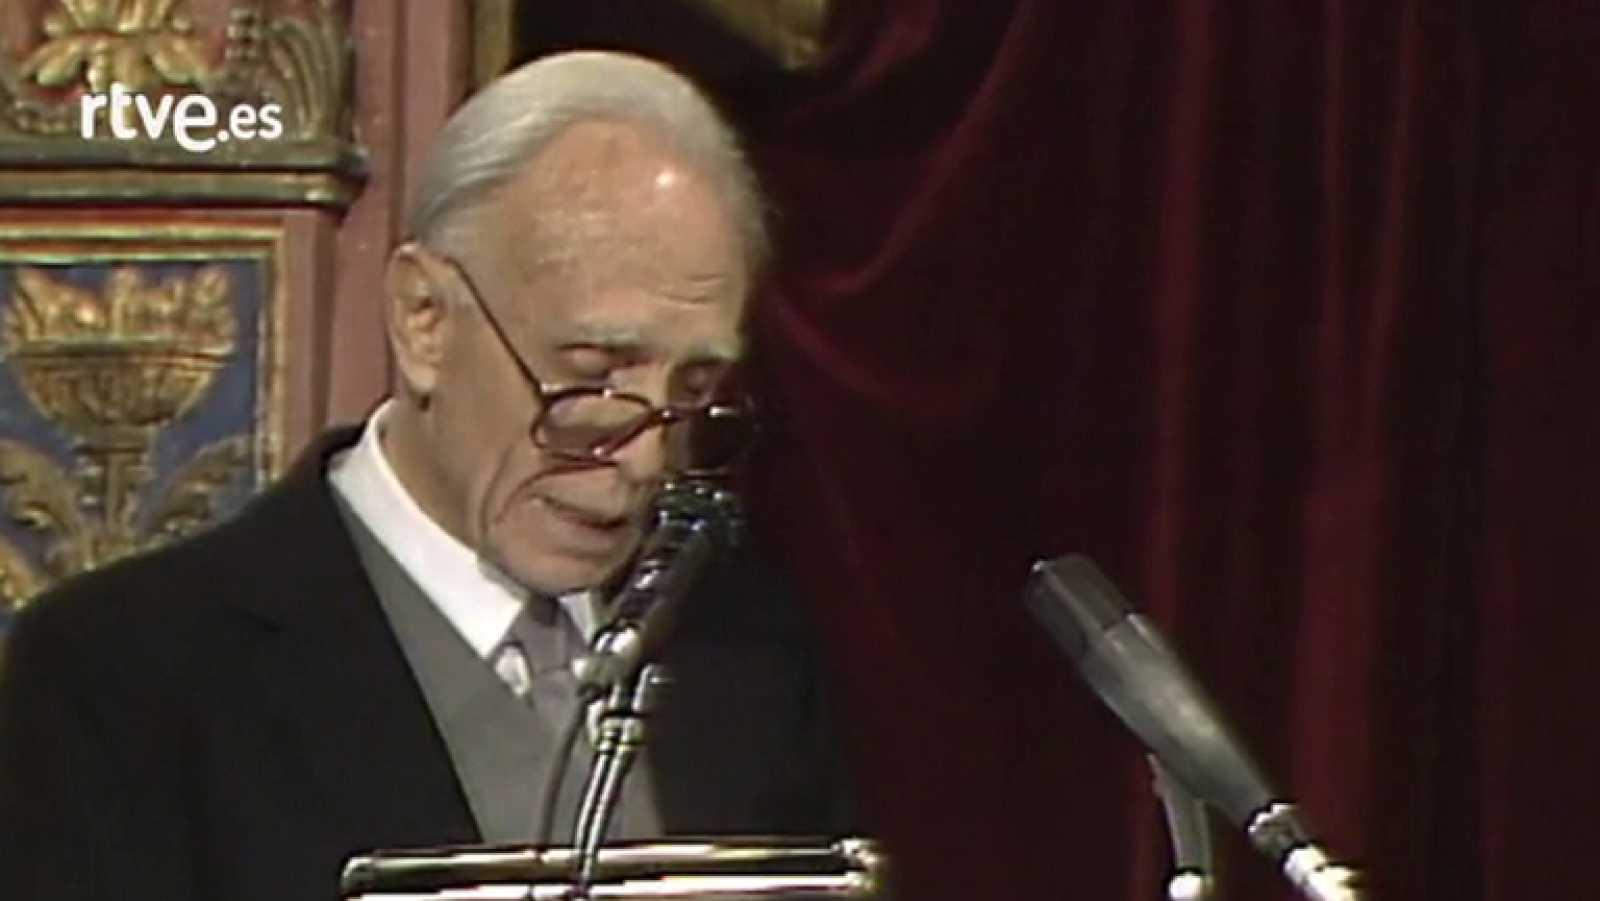 Discurso Adolfo Bioy Casares, Premio Cervantes 1990